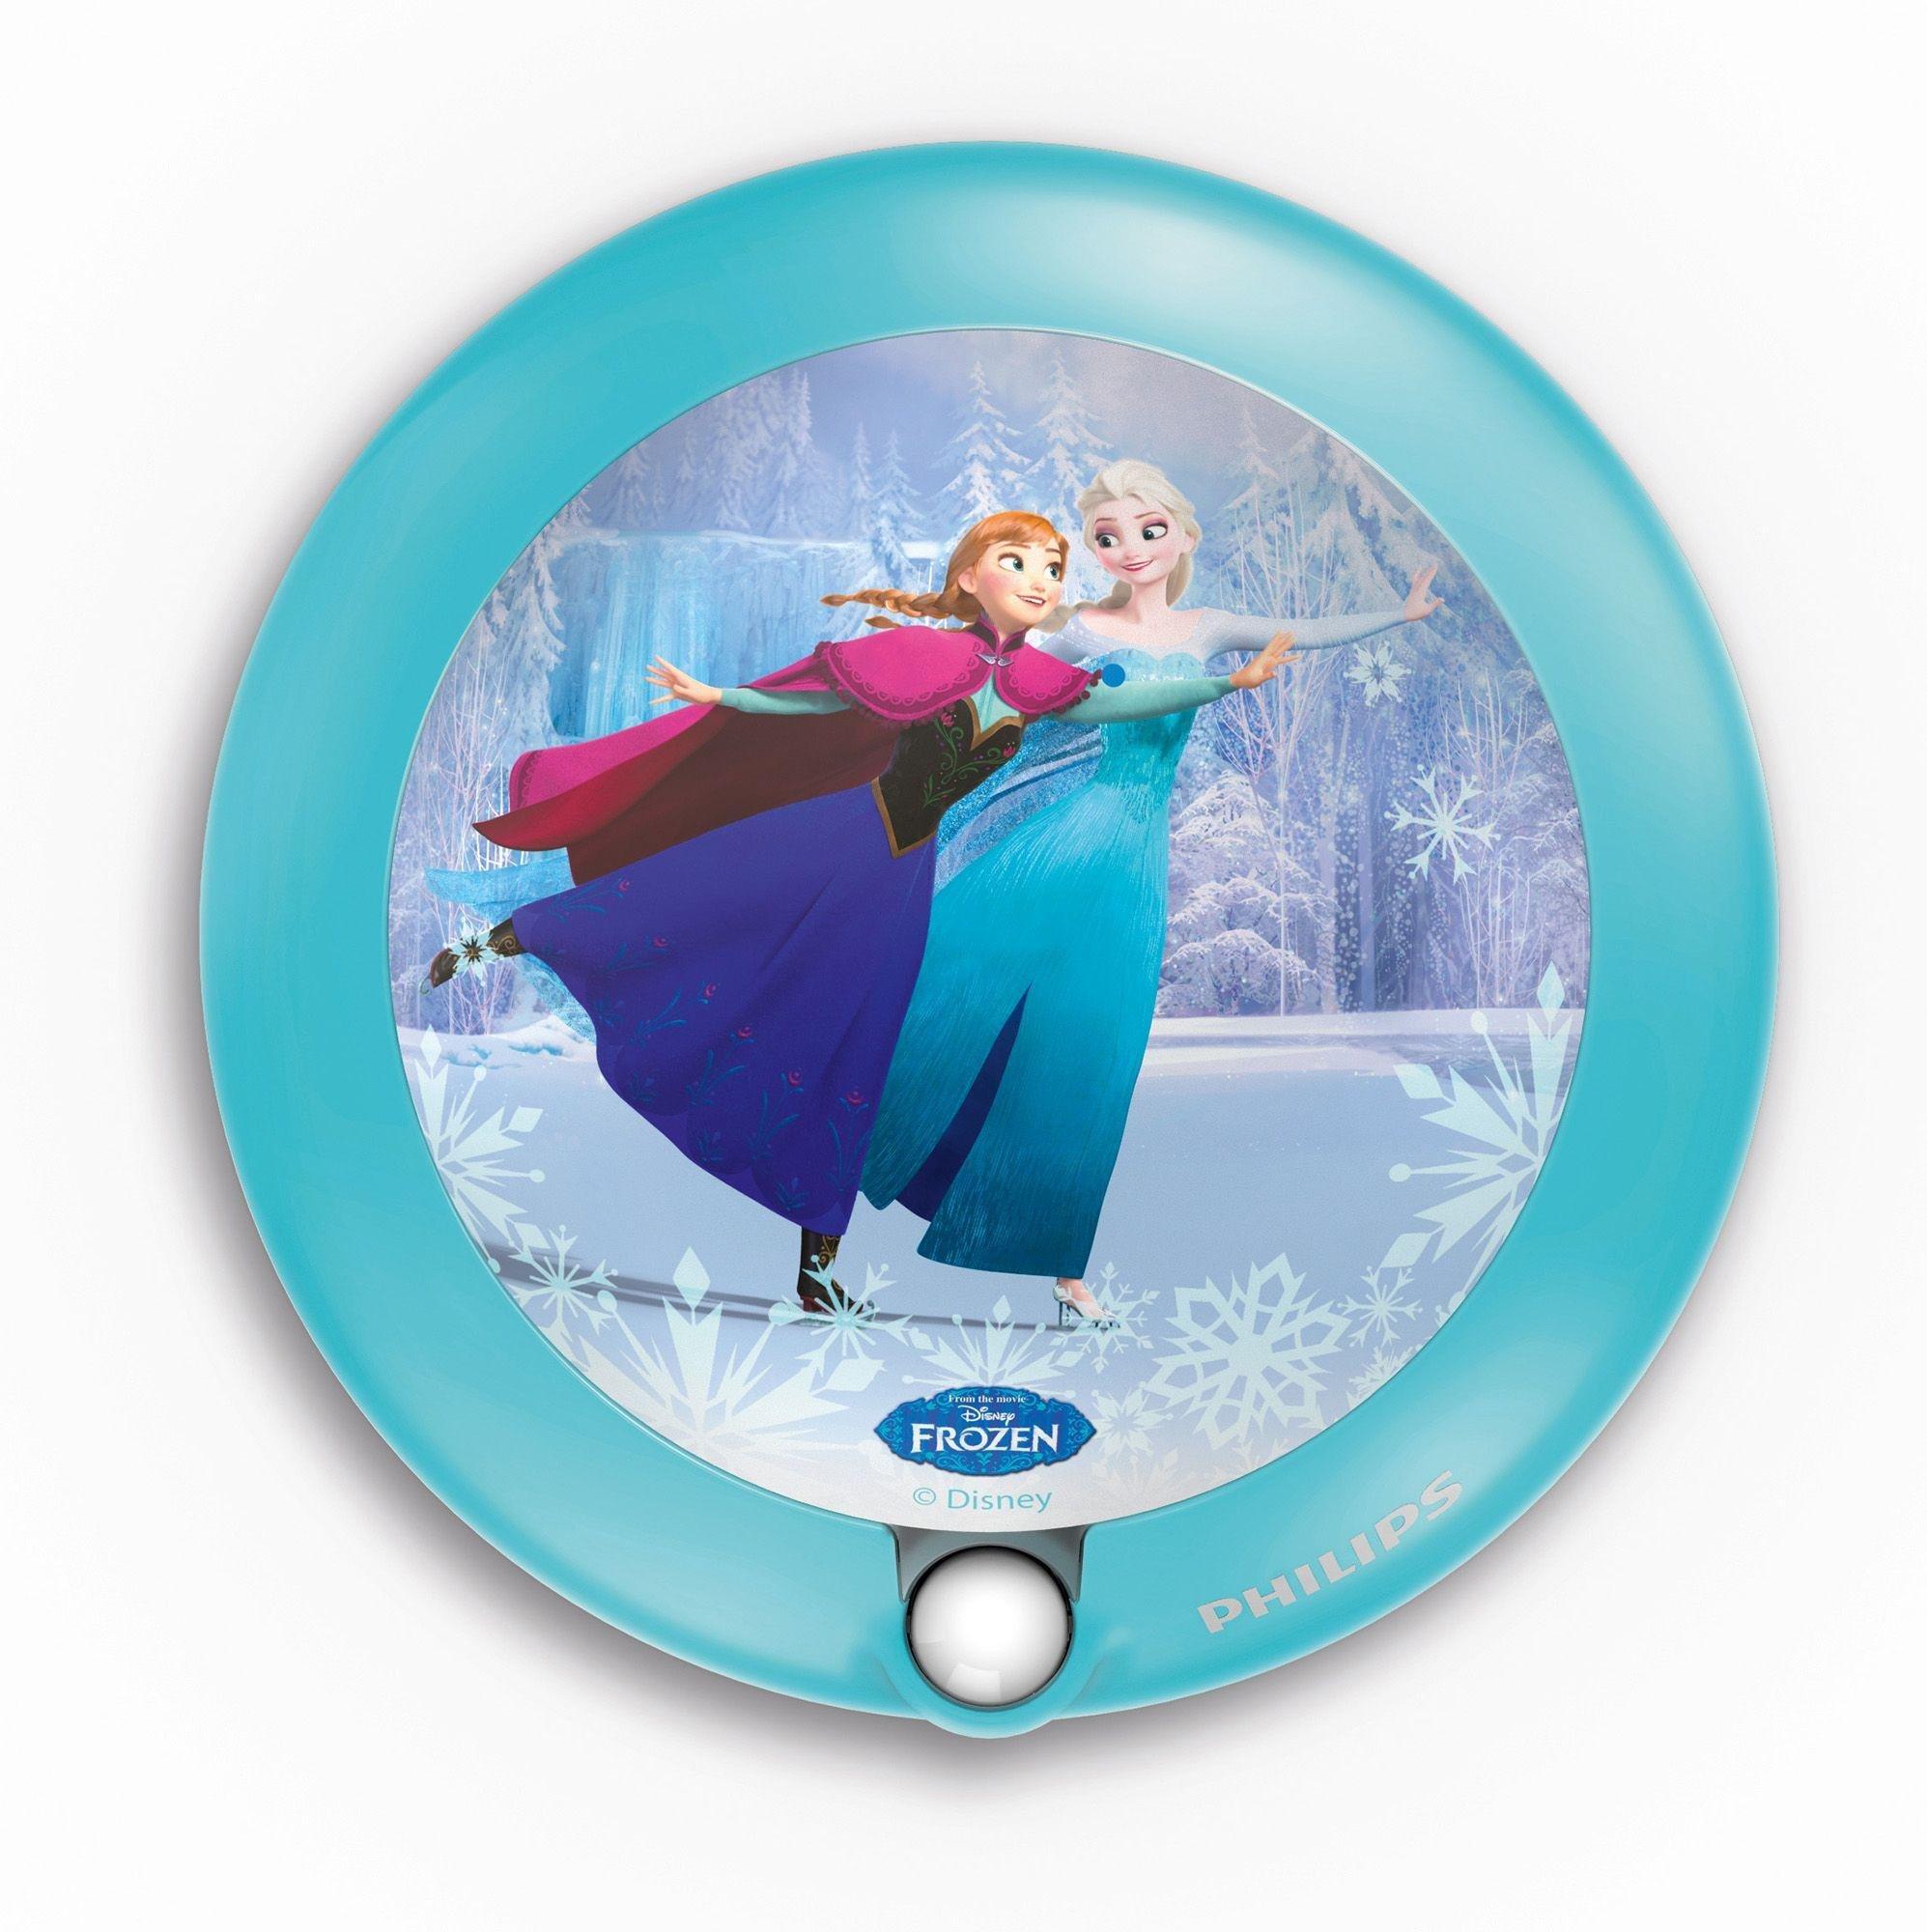 Philips Disney Frozen LED Night Light - Blue